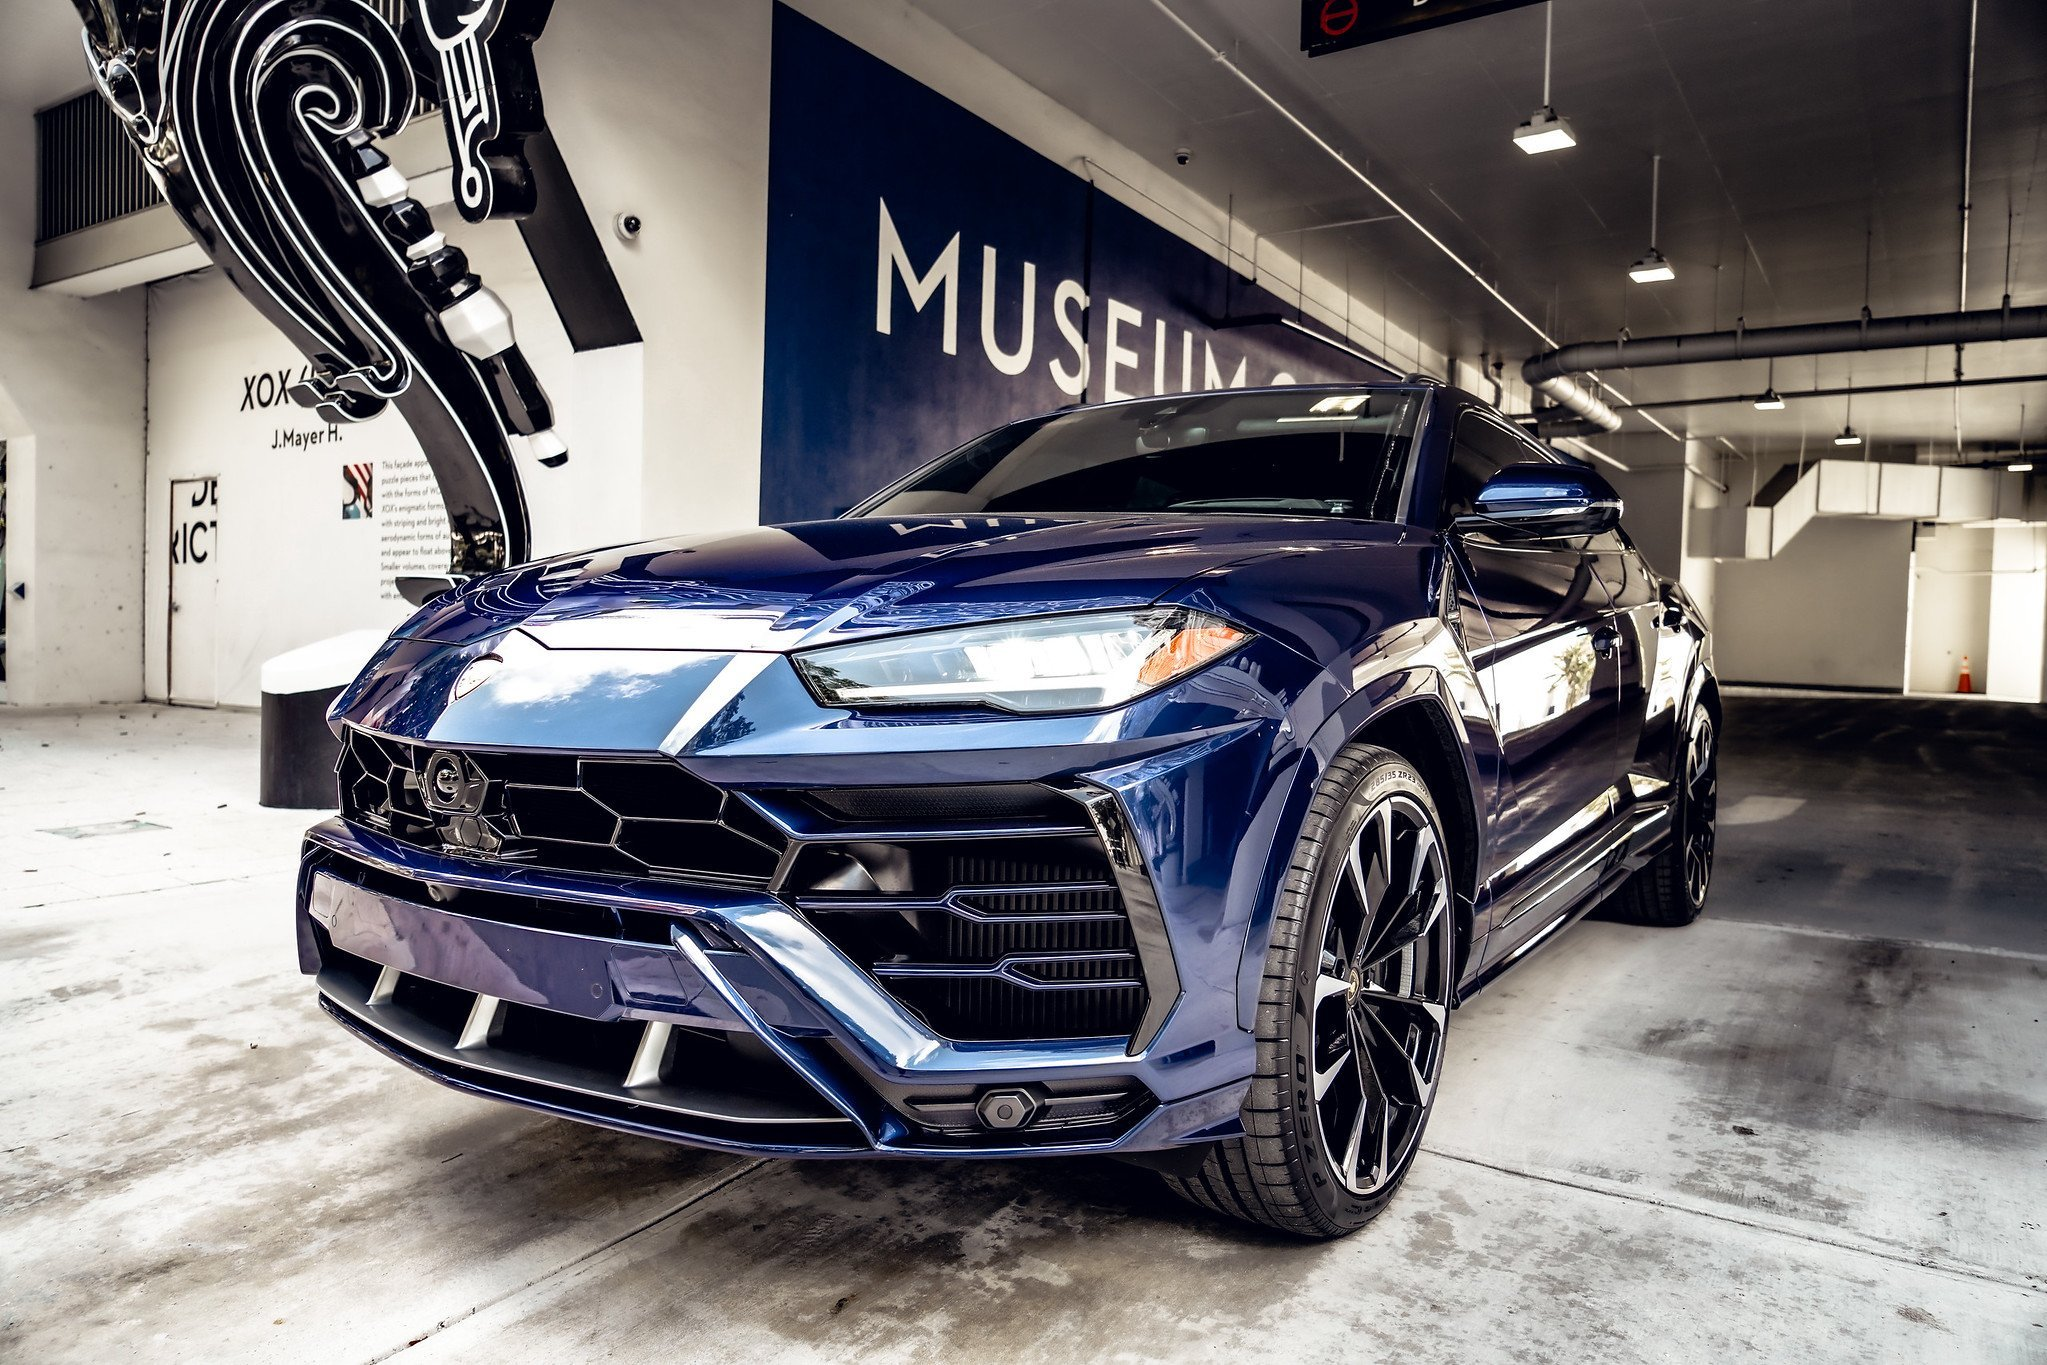 Image #12 of our  2021 Lamborghini Urus - Dark Blue    In Miami Fort Lauderdale Palm Beach South Florida